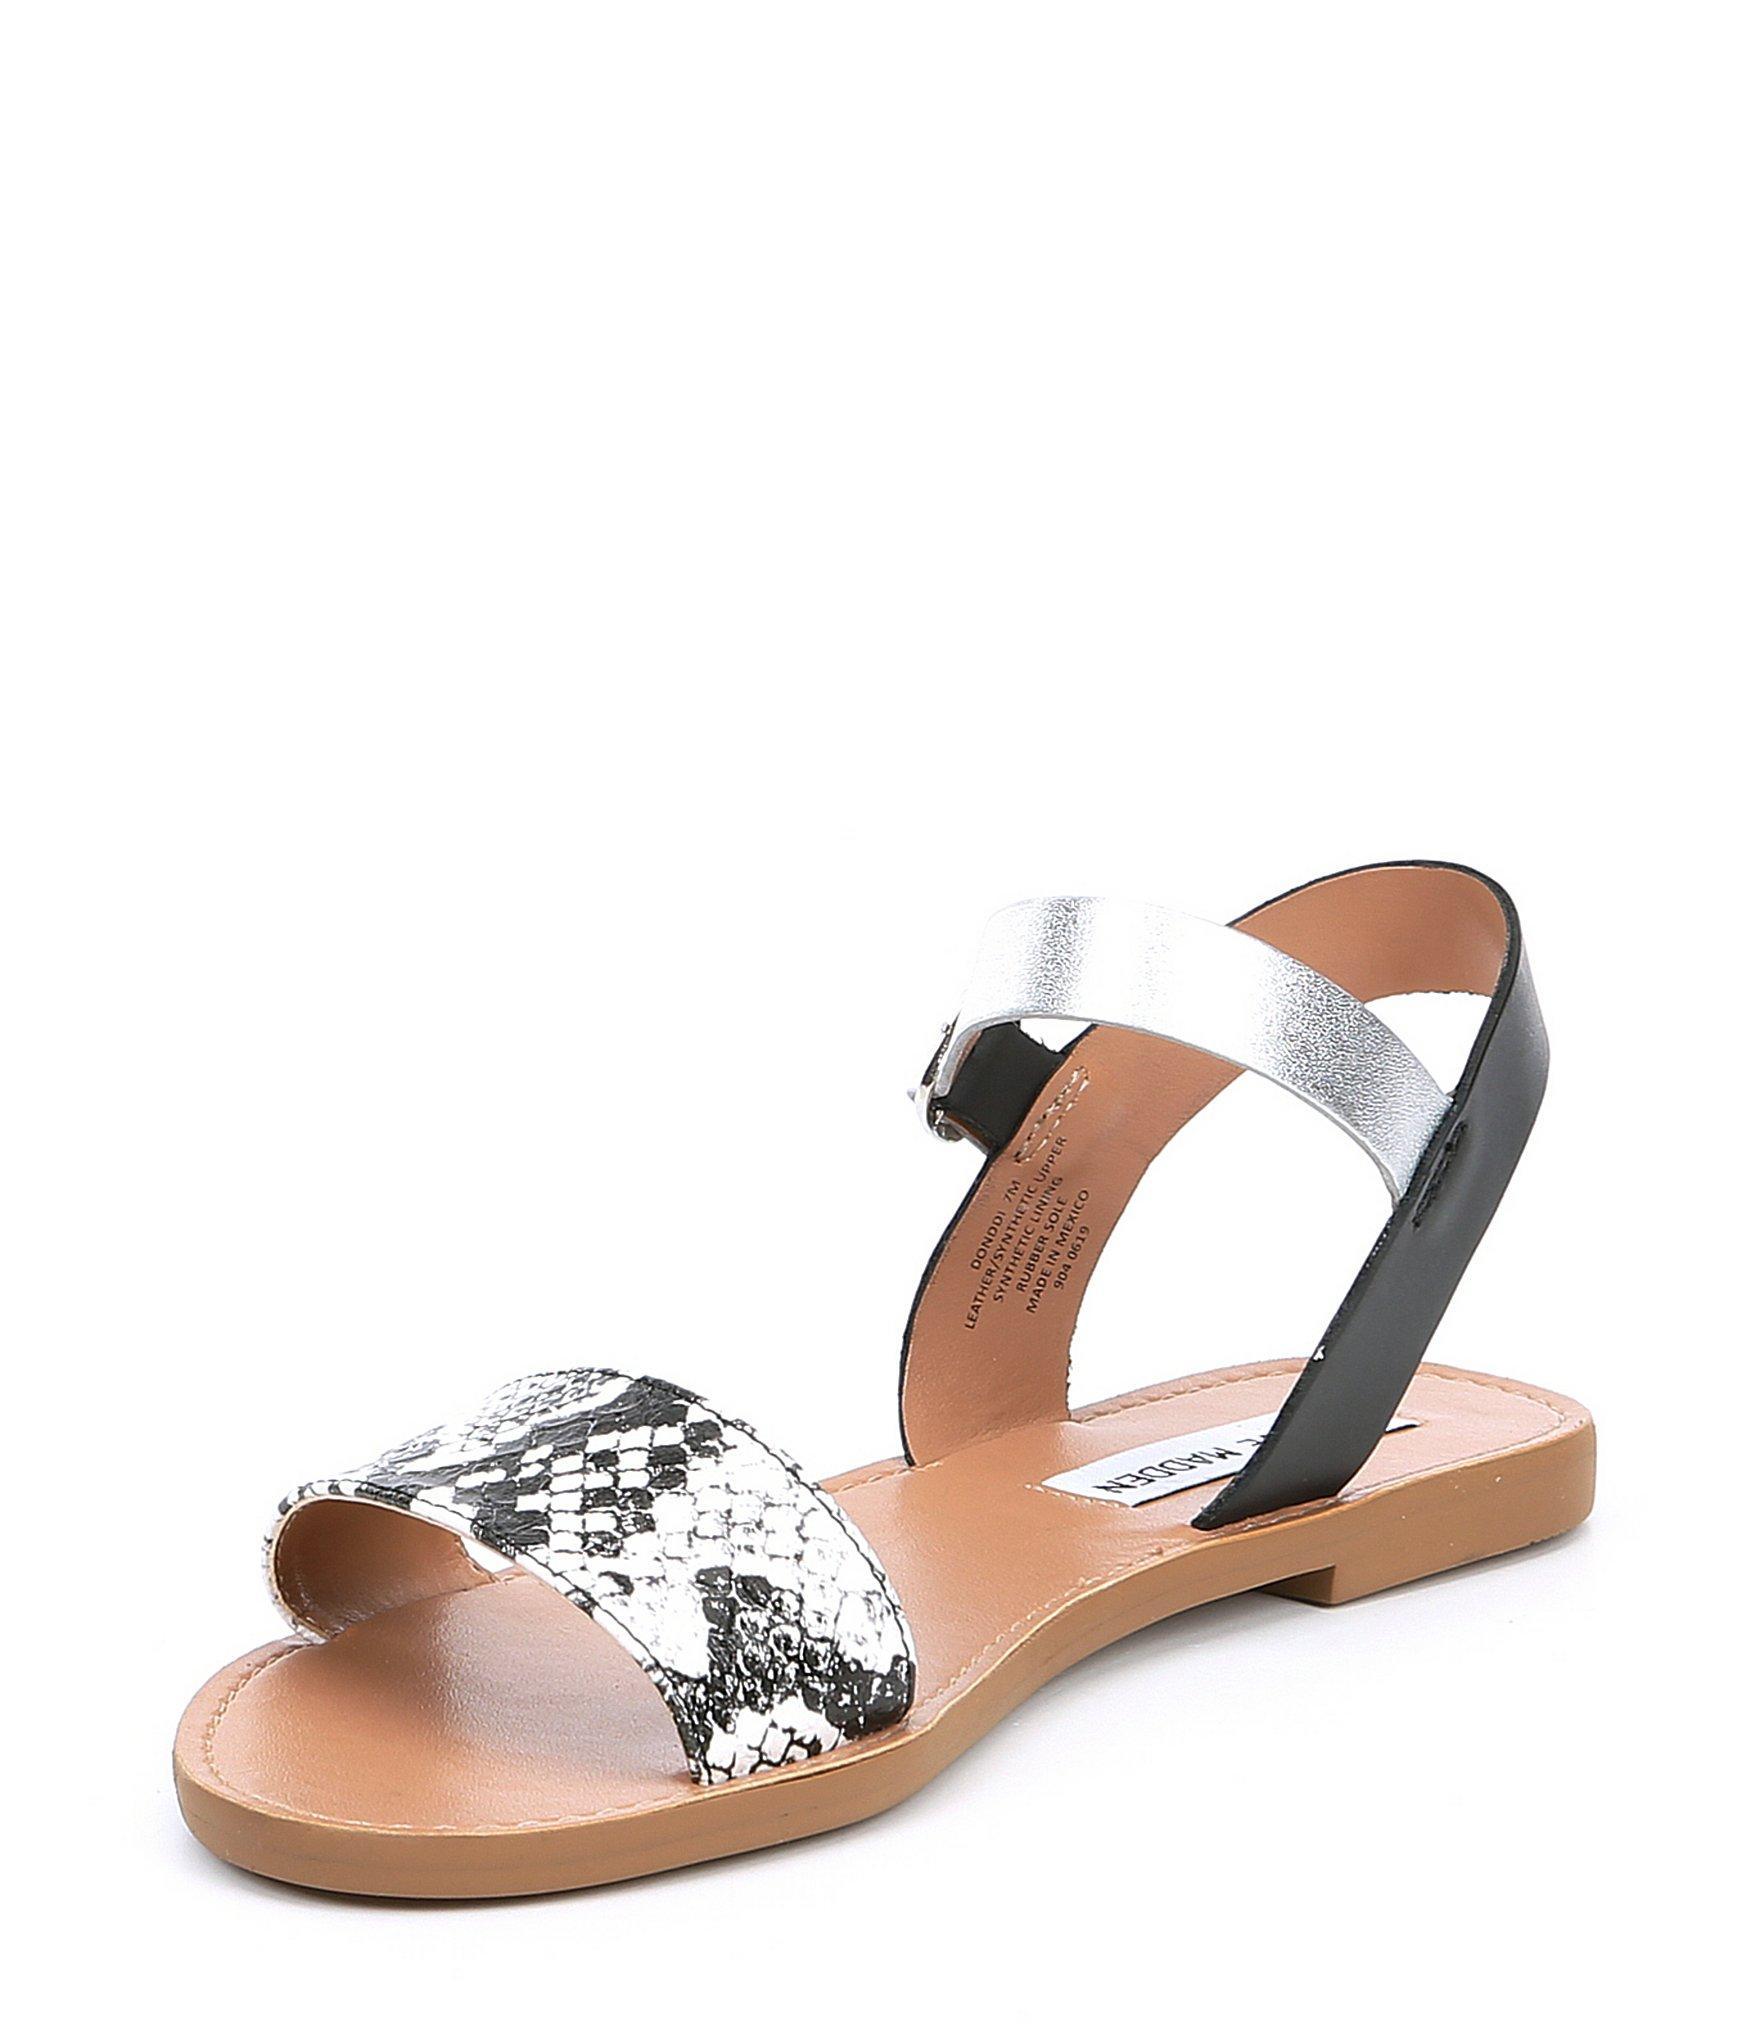 c7677841554 Lyst - Steve Madden Donddi Snake Banded Flat Sandals